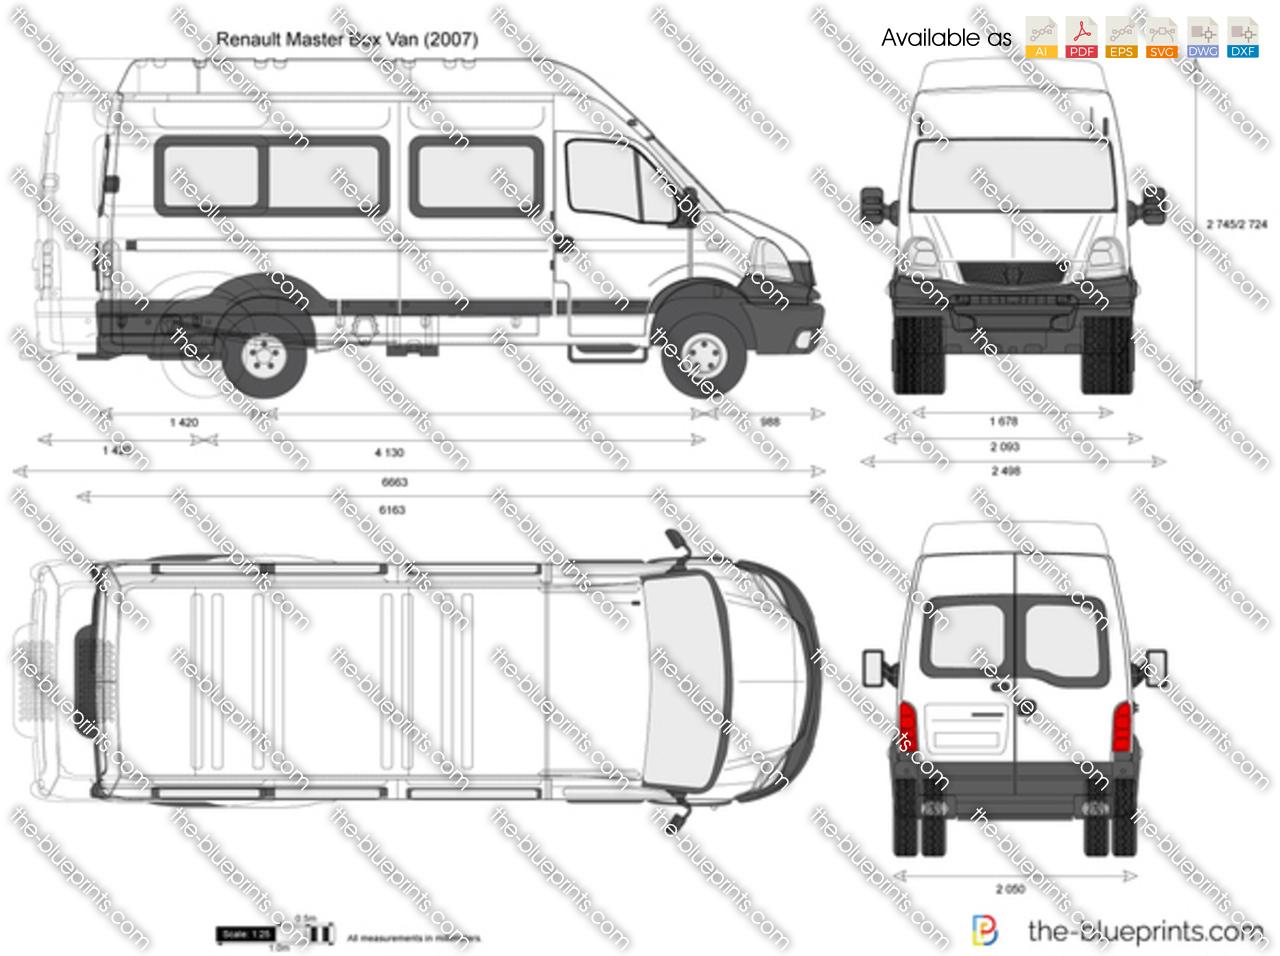 Renault Master Box Van 2010